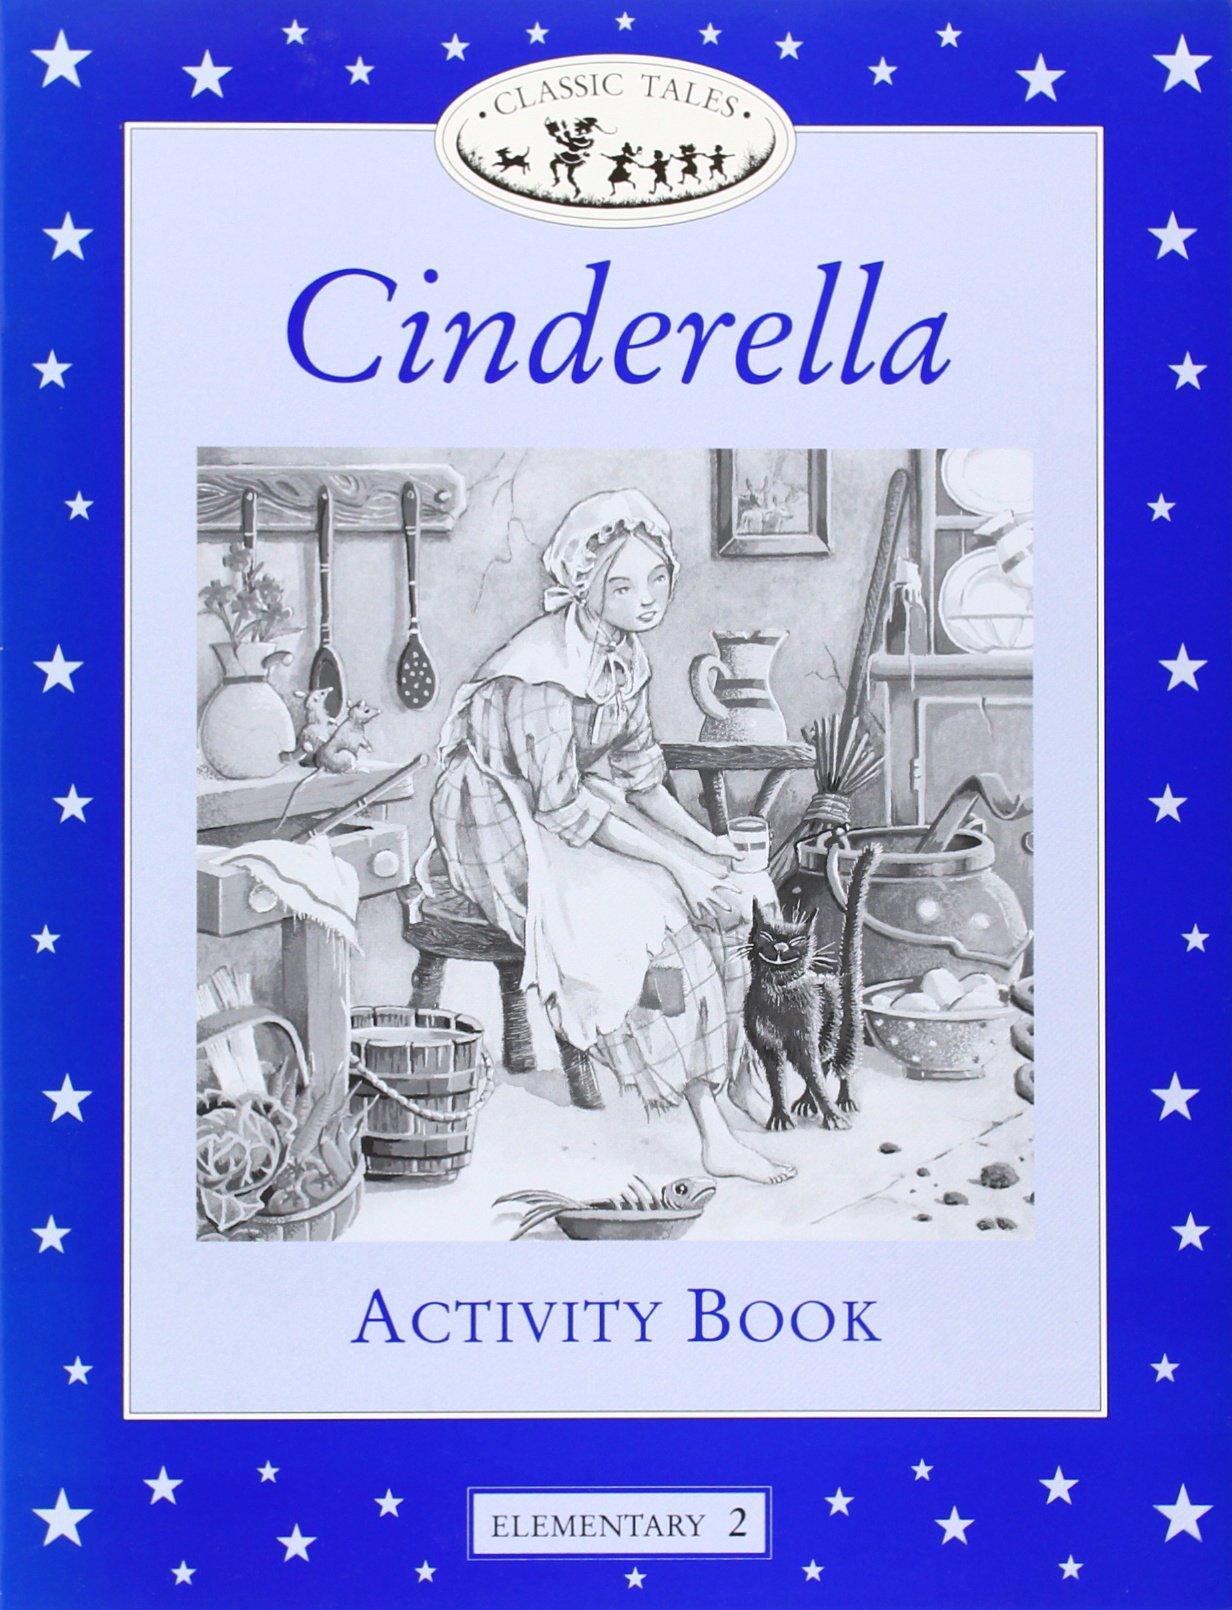 Cinderella (könyv) Sue Arengo | Rukkola.hu